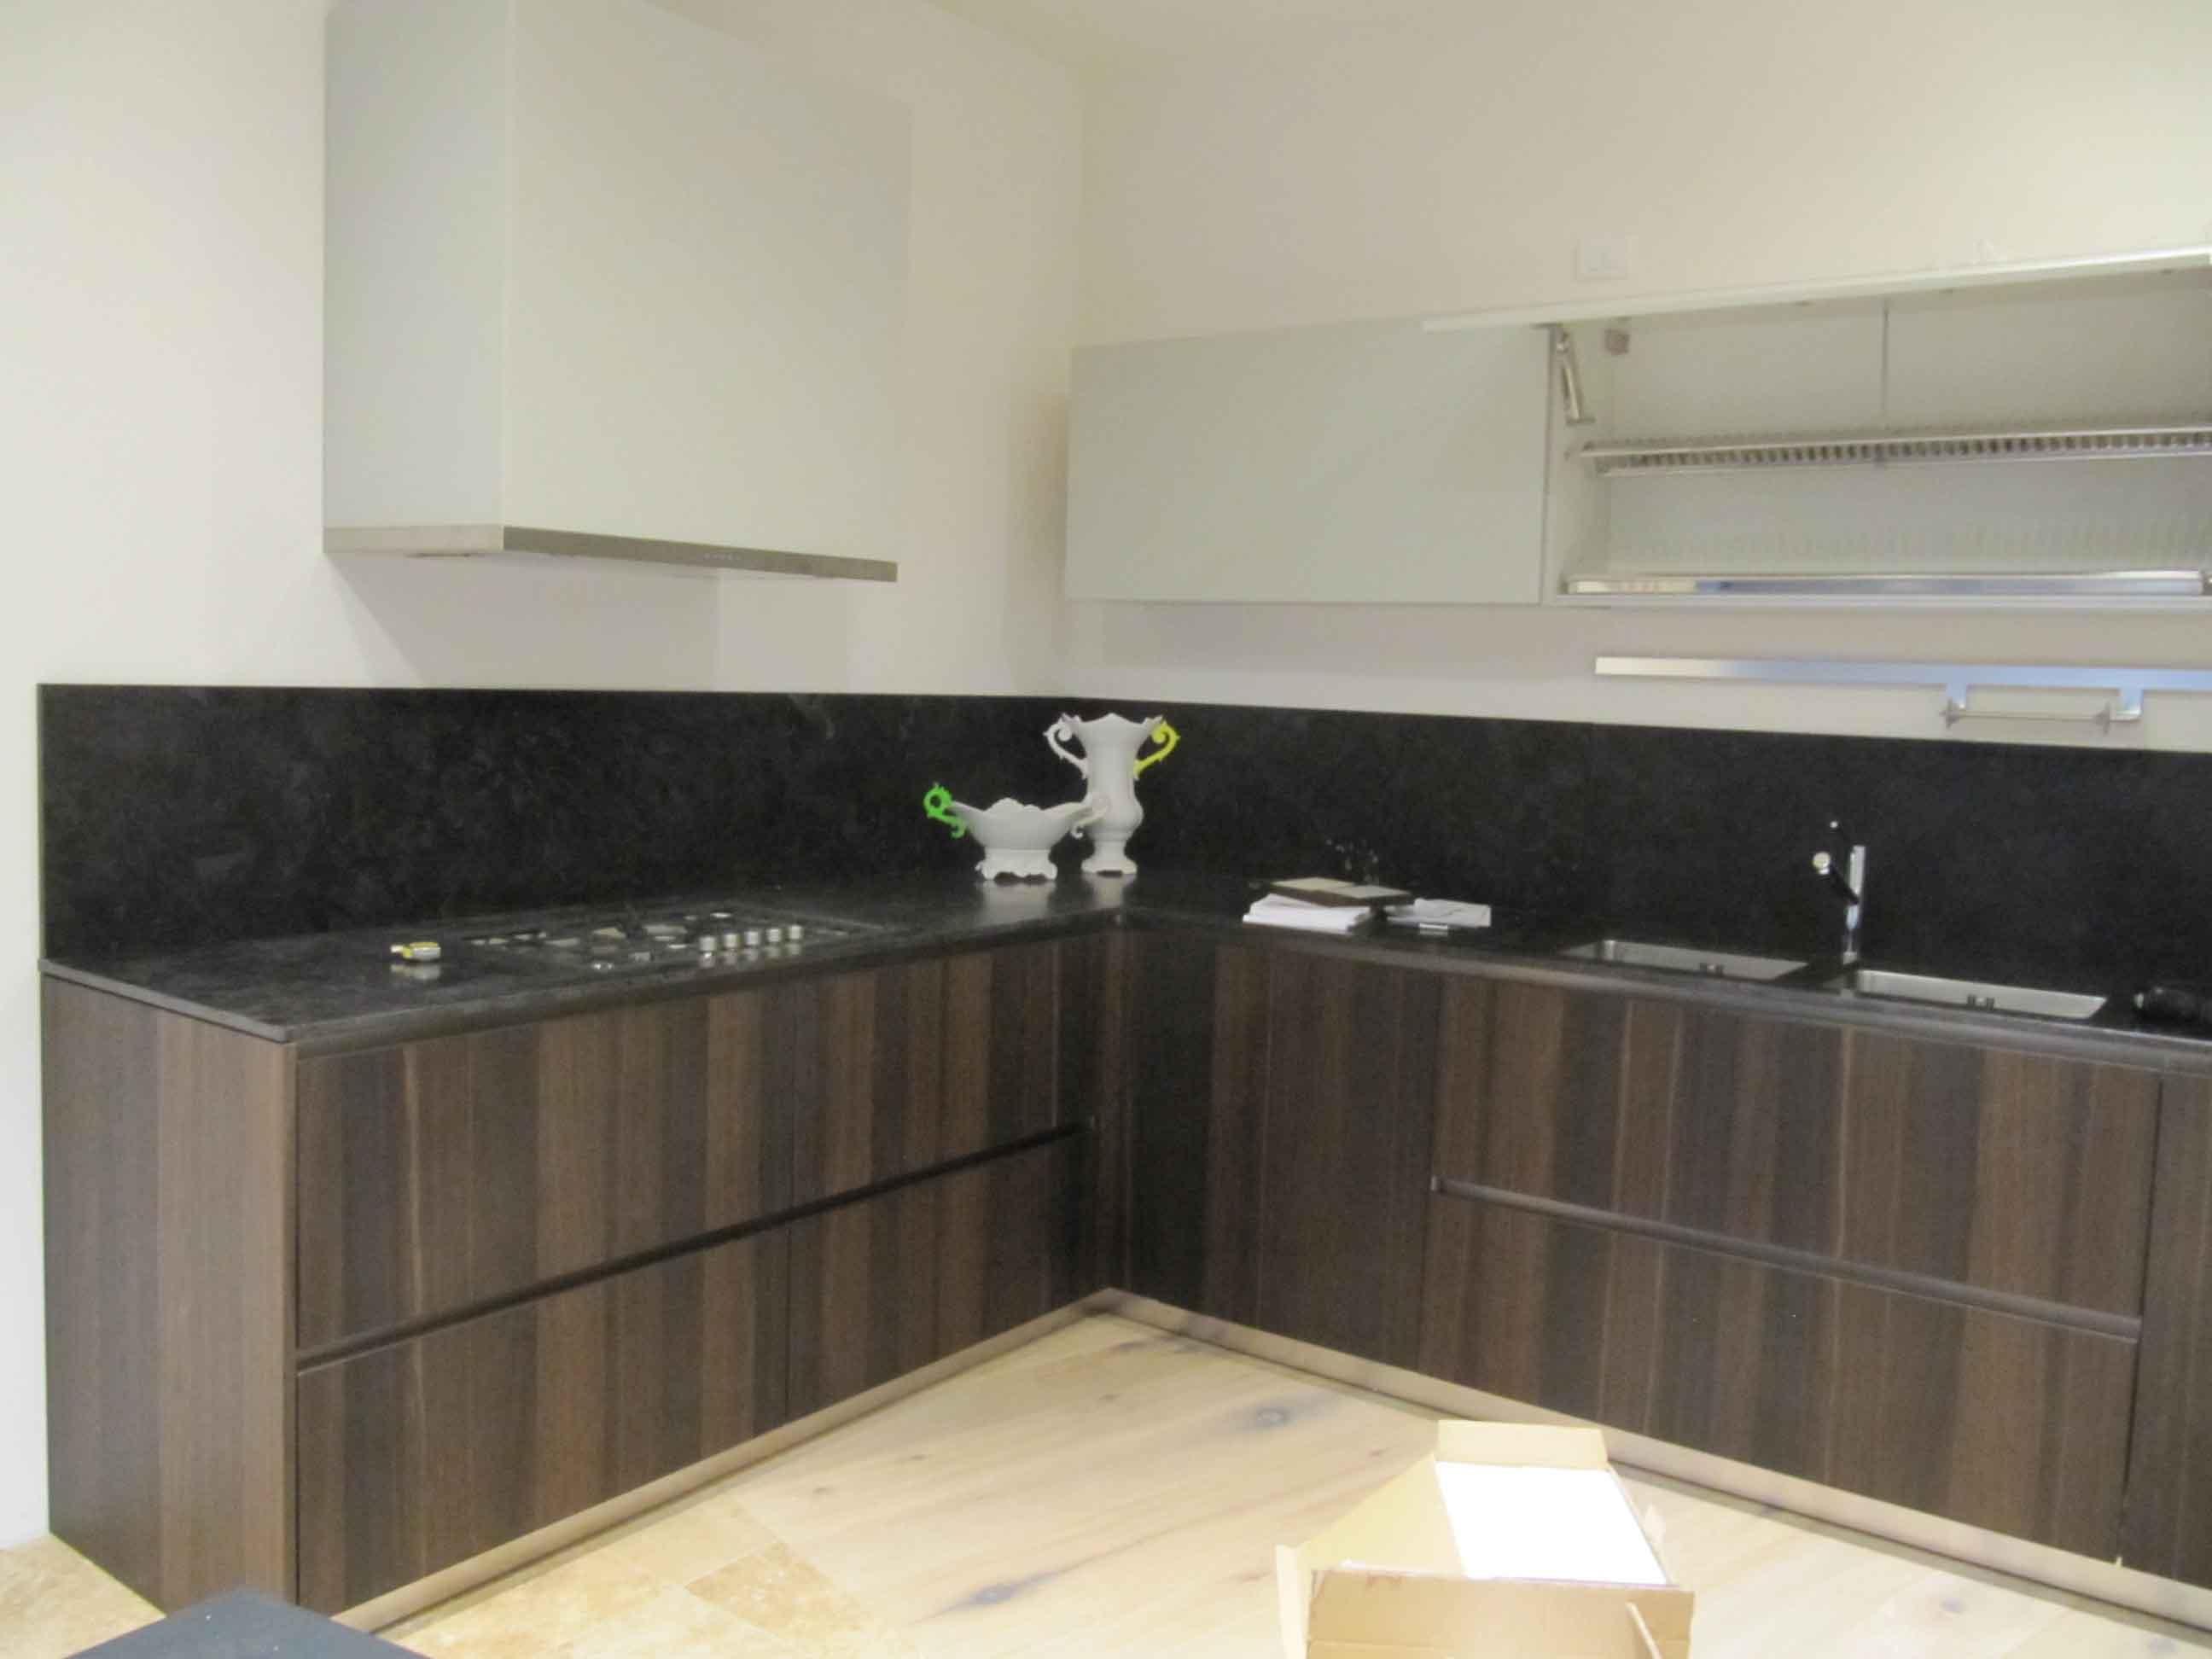 Cucina design legno rovere cucine a prezzi scontati for Design cucina